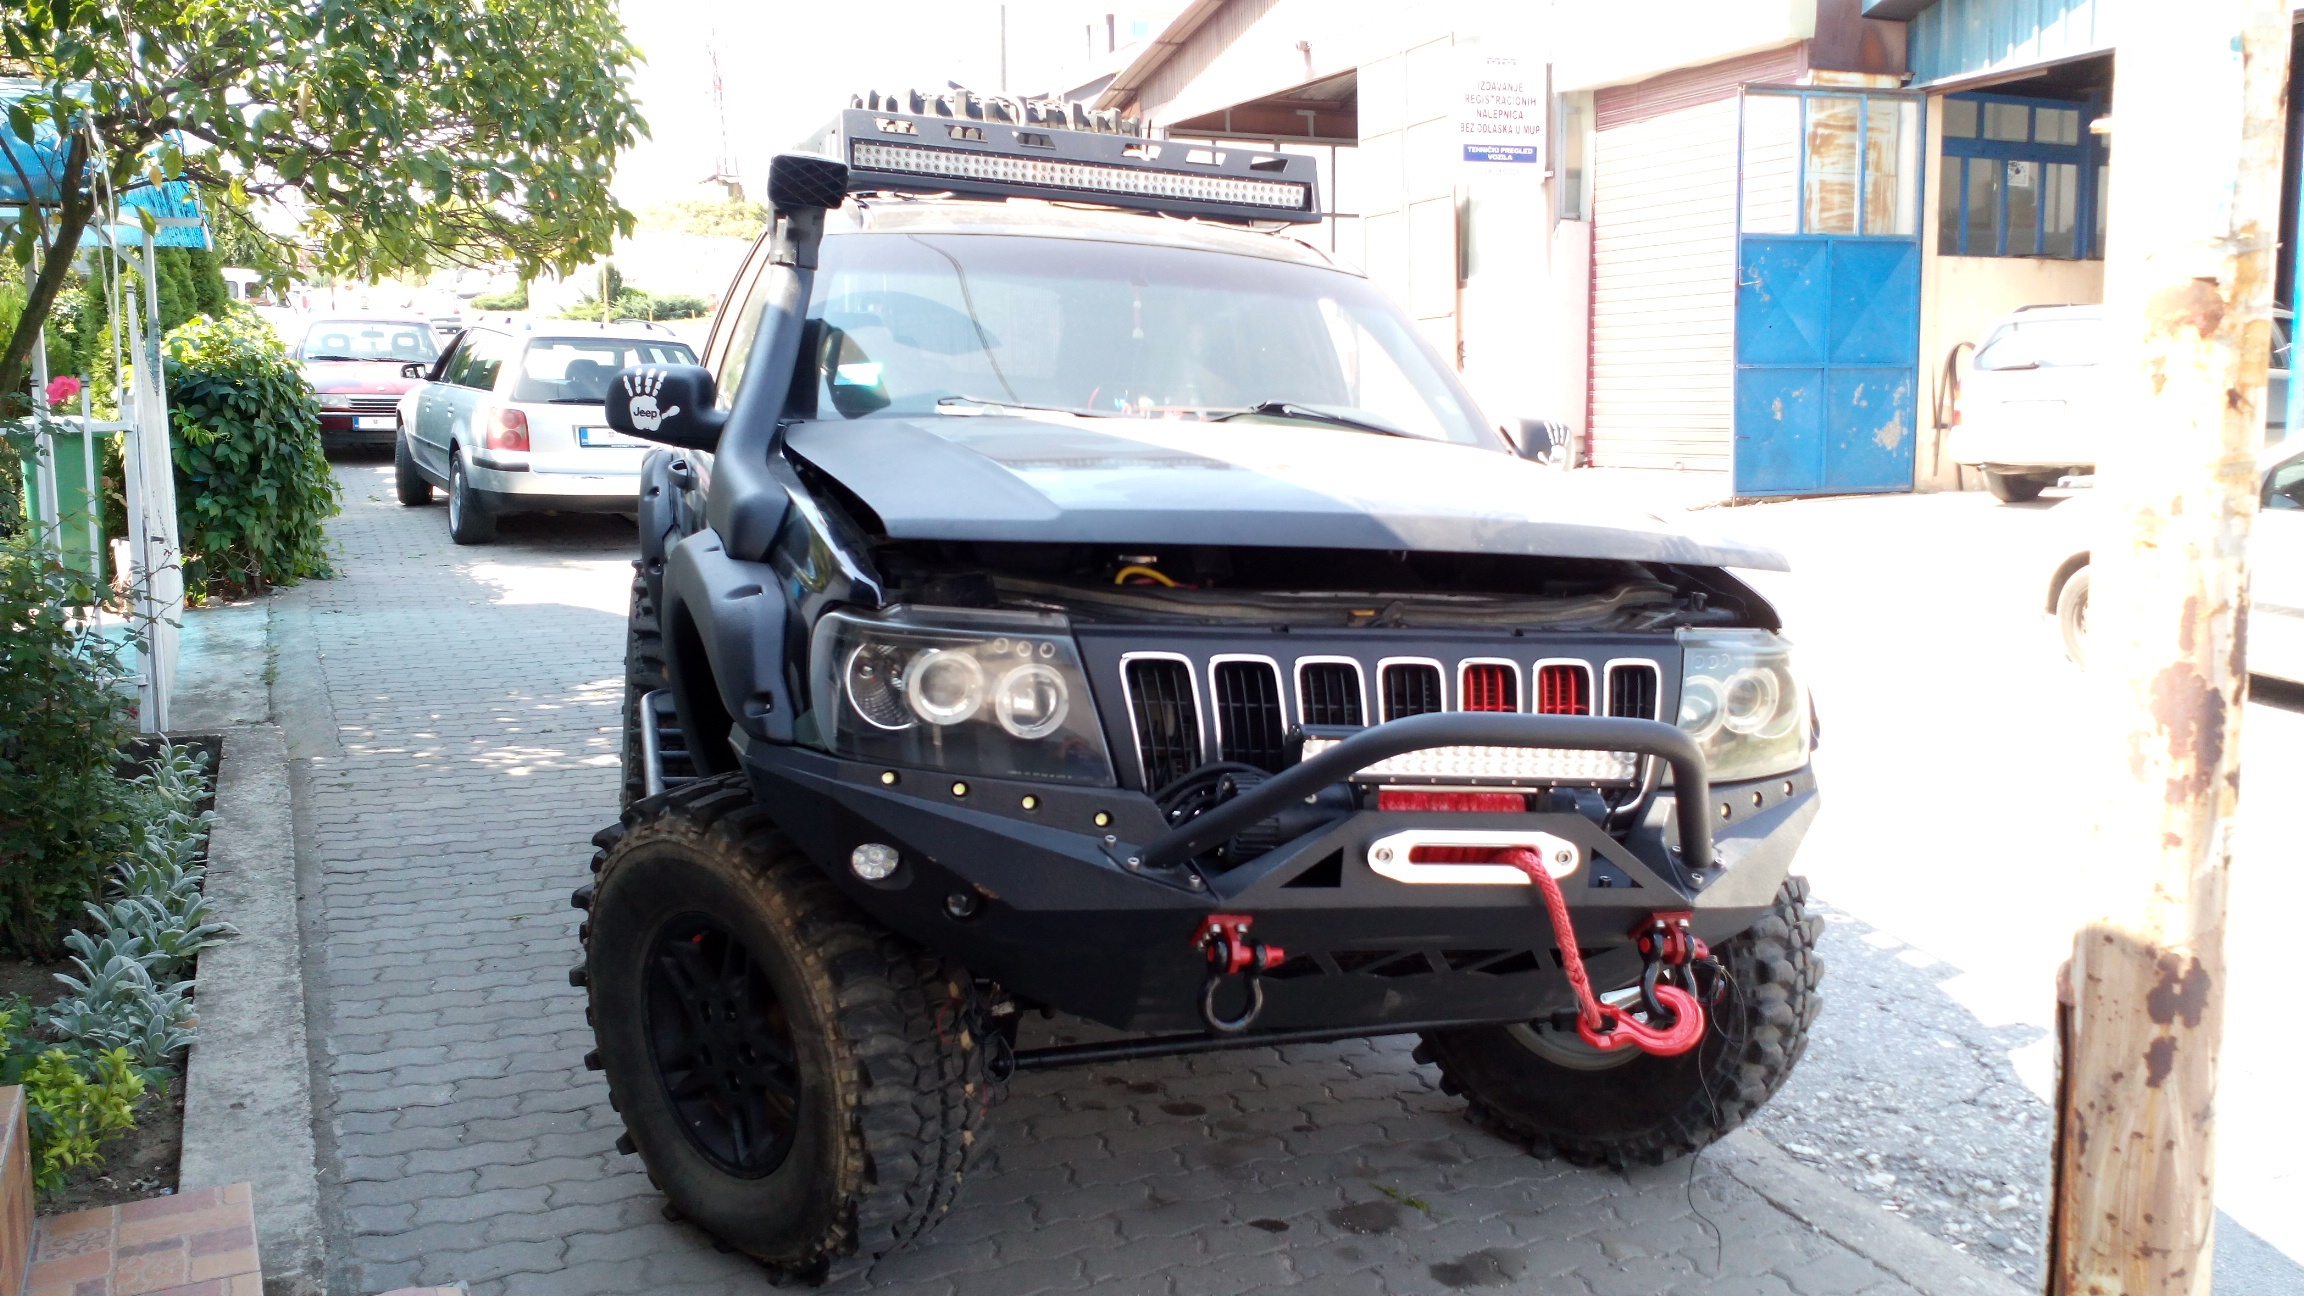 Beautiful File:Jeep Grand Cherokee WJ Offroad Front